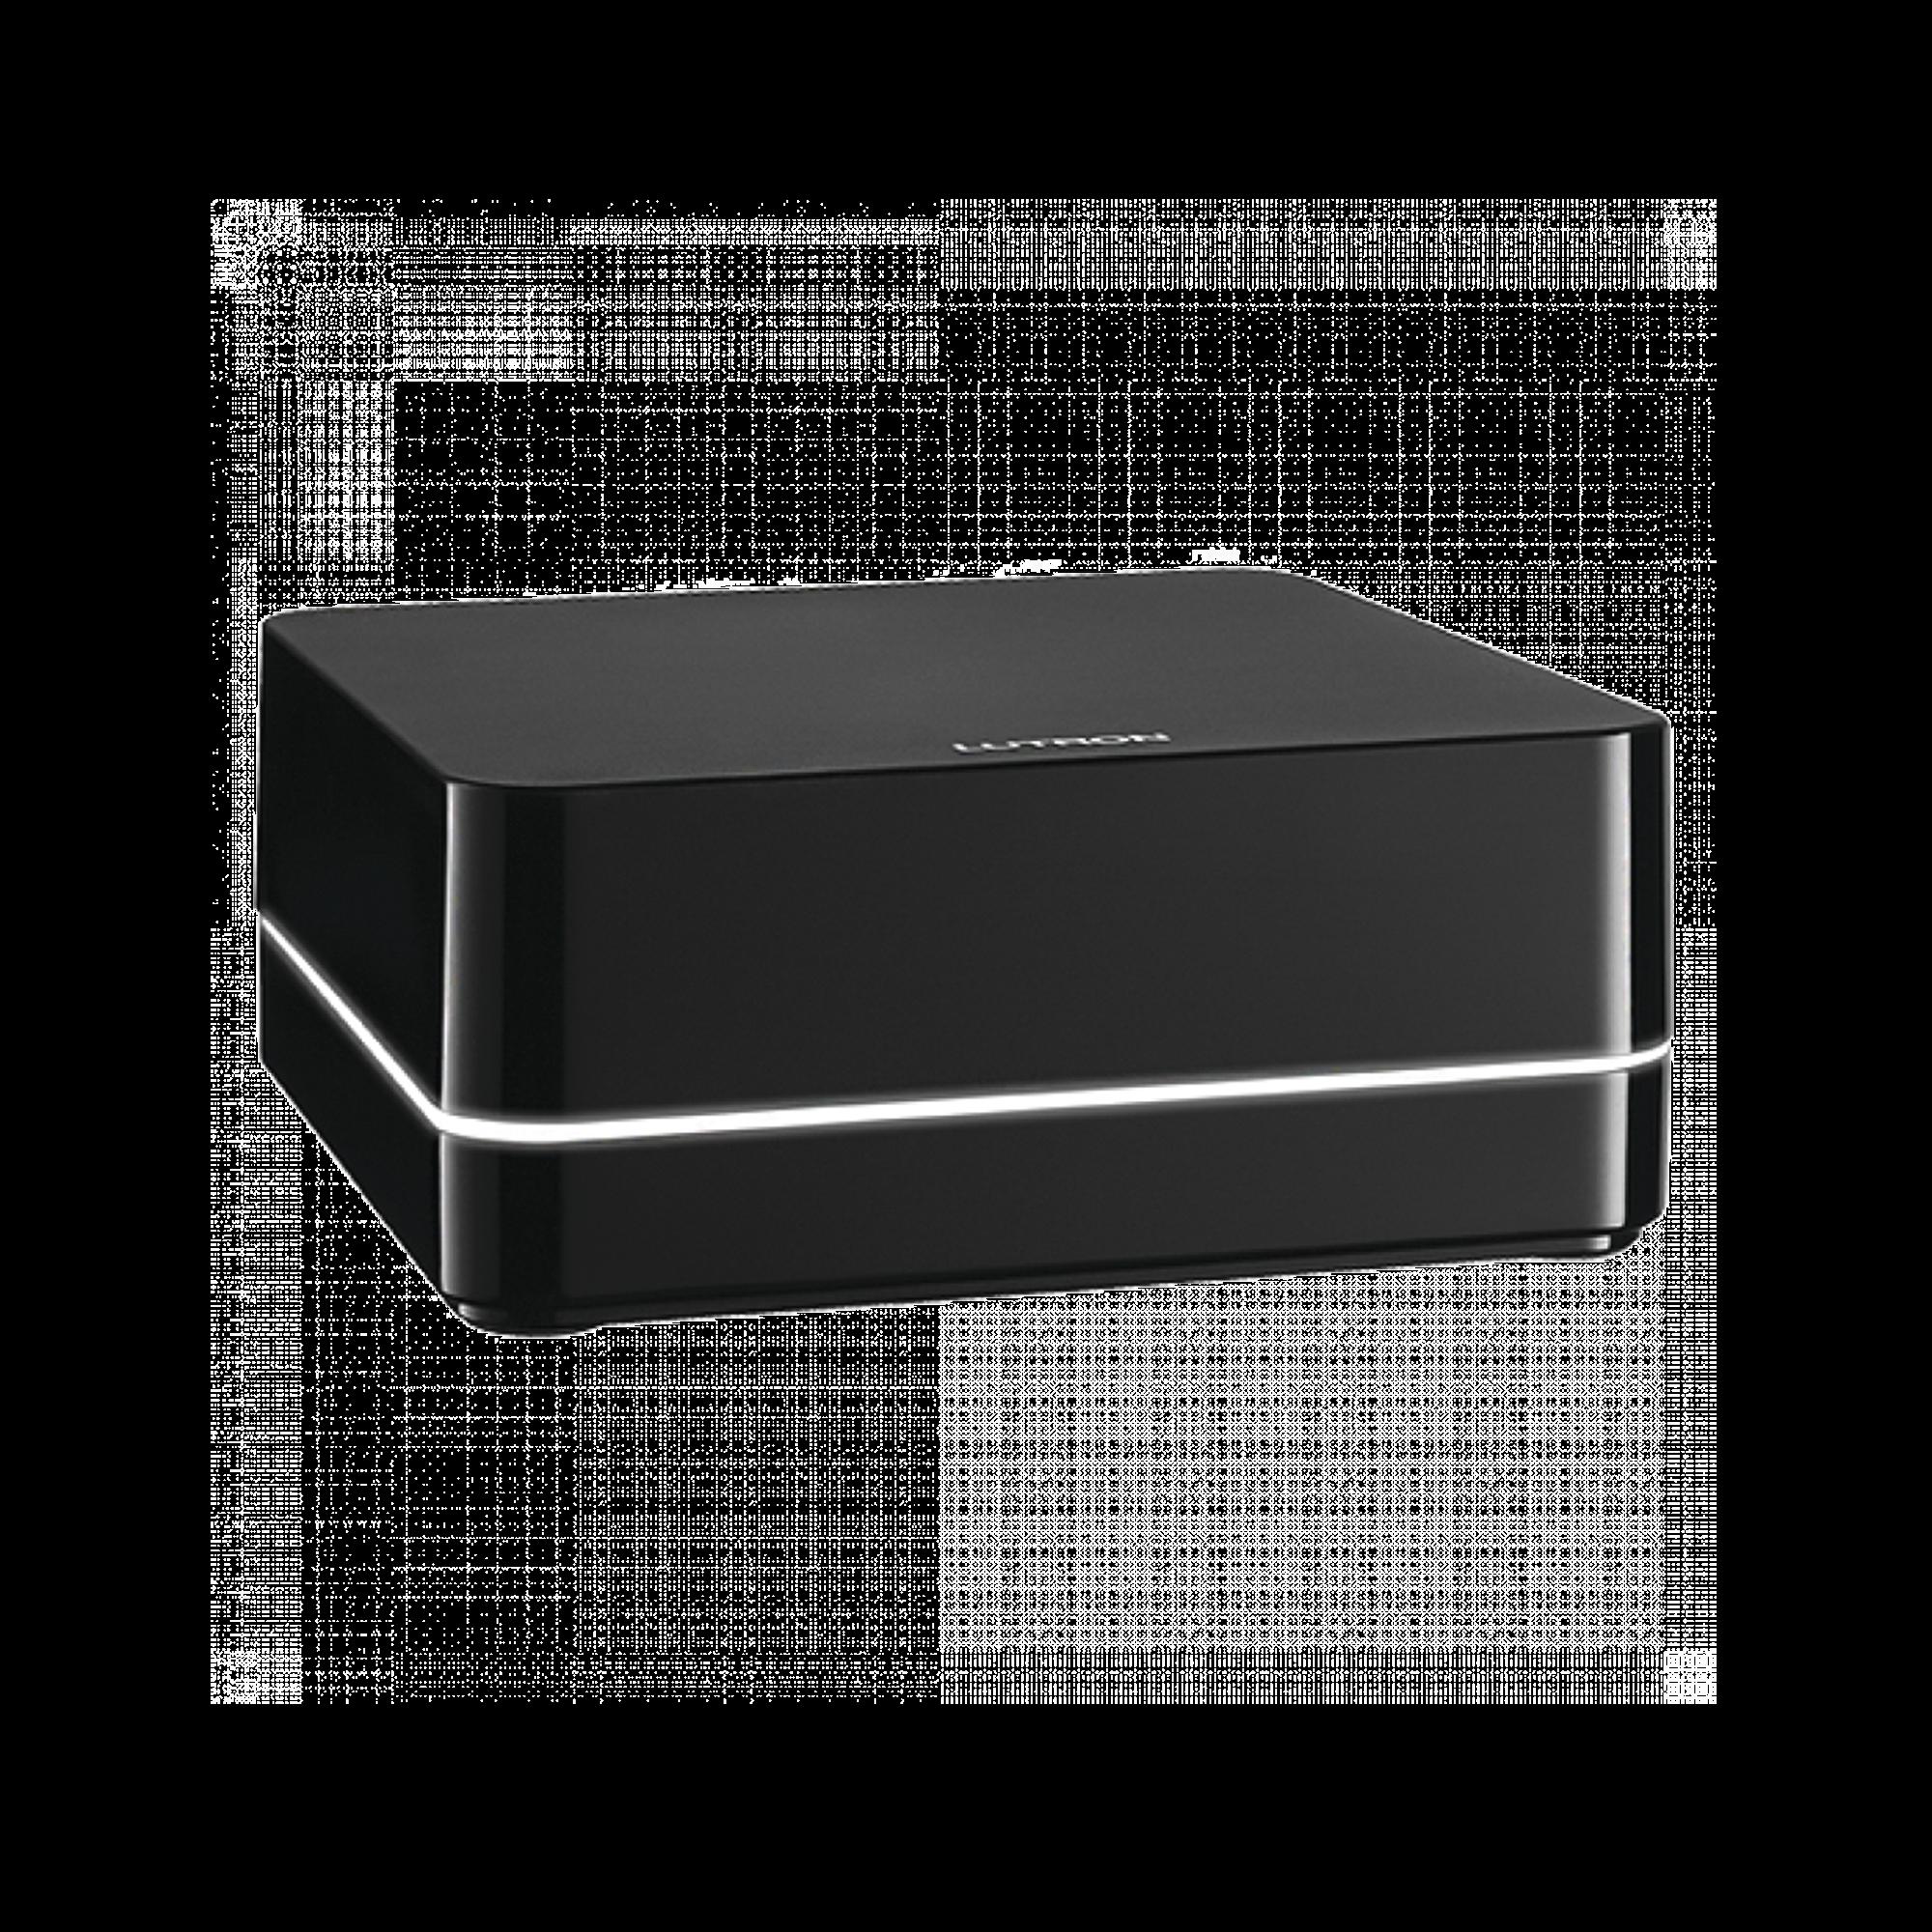 Repetidora RA2 Select inalámbrica para controlador, agregue hasta 4 al receptor principal RRSELREP2BL.